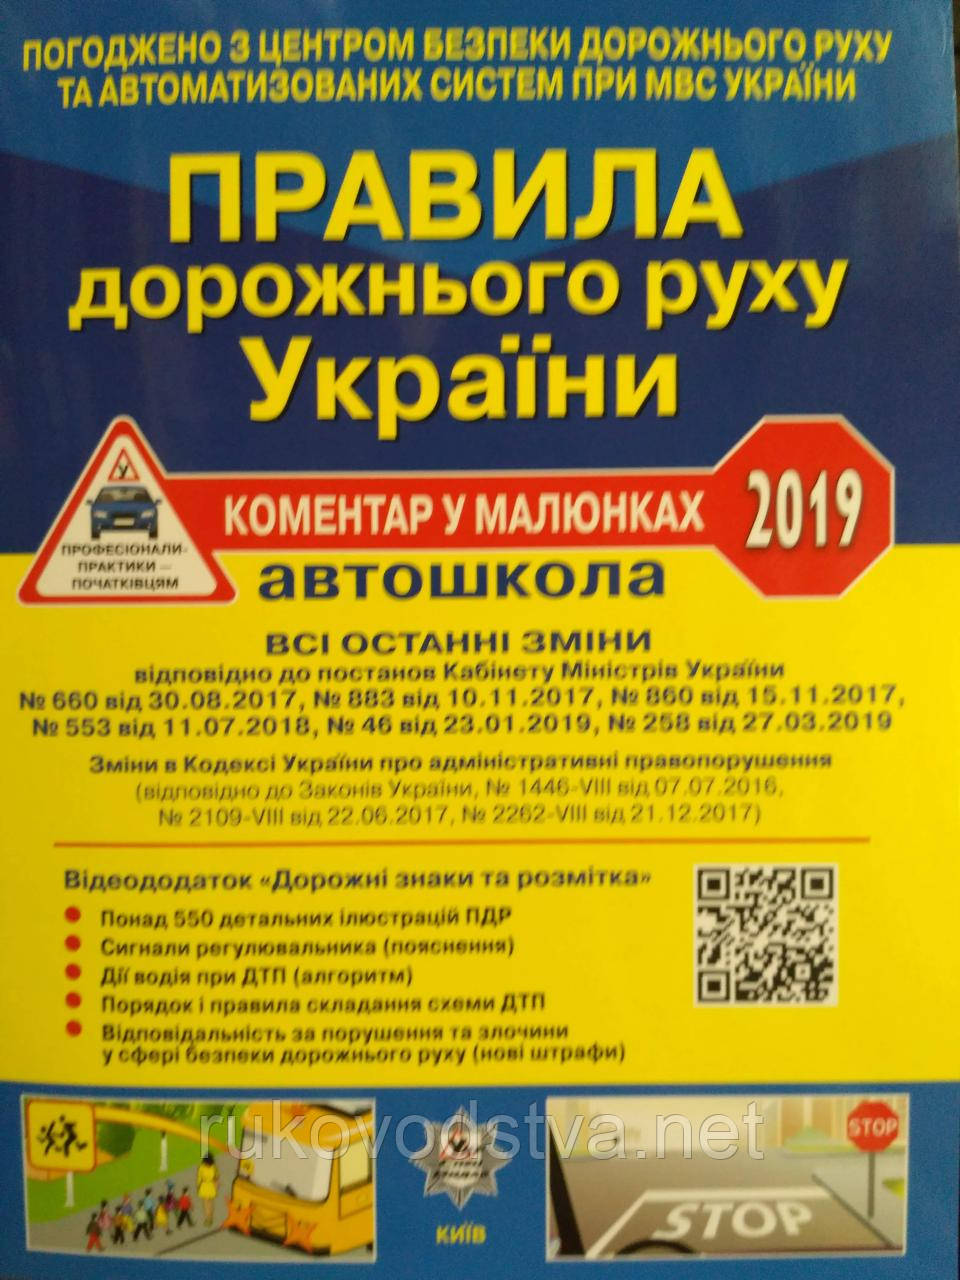 Правила дорожнього руху України, коментар в малюнках на газетному папері